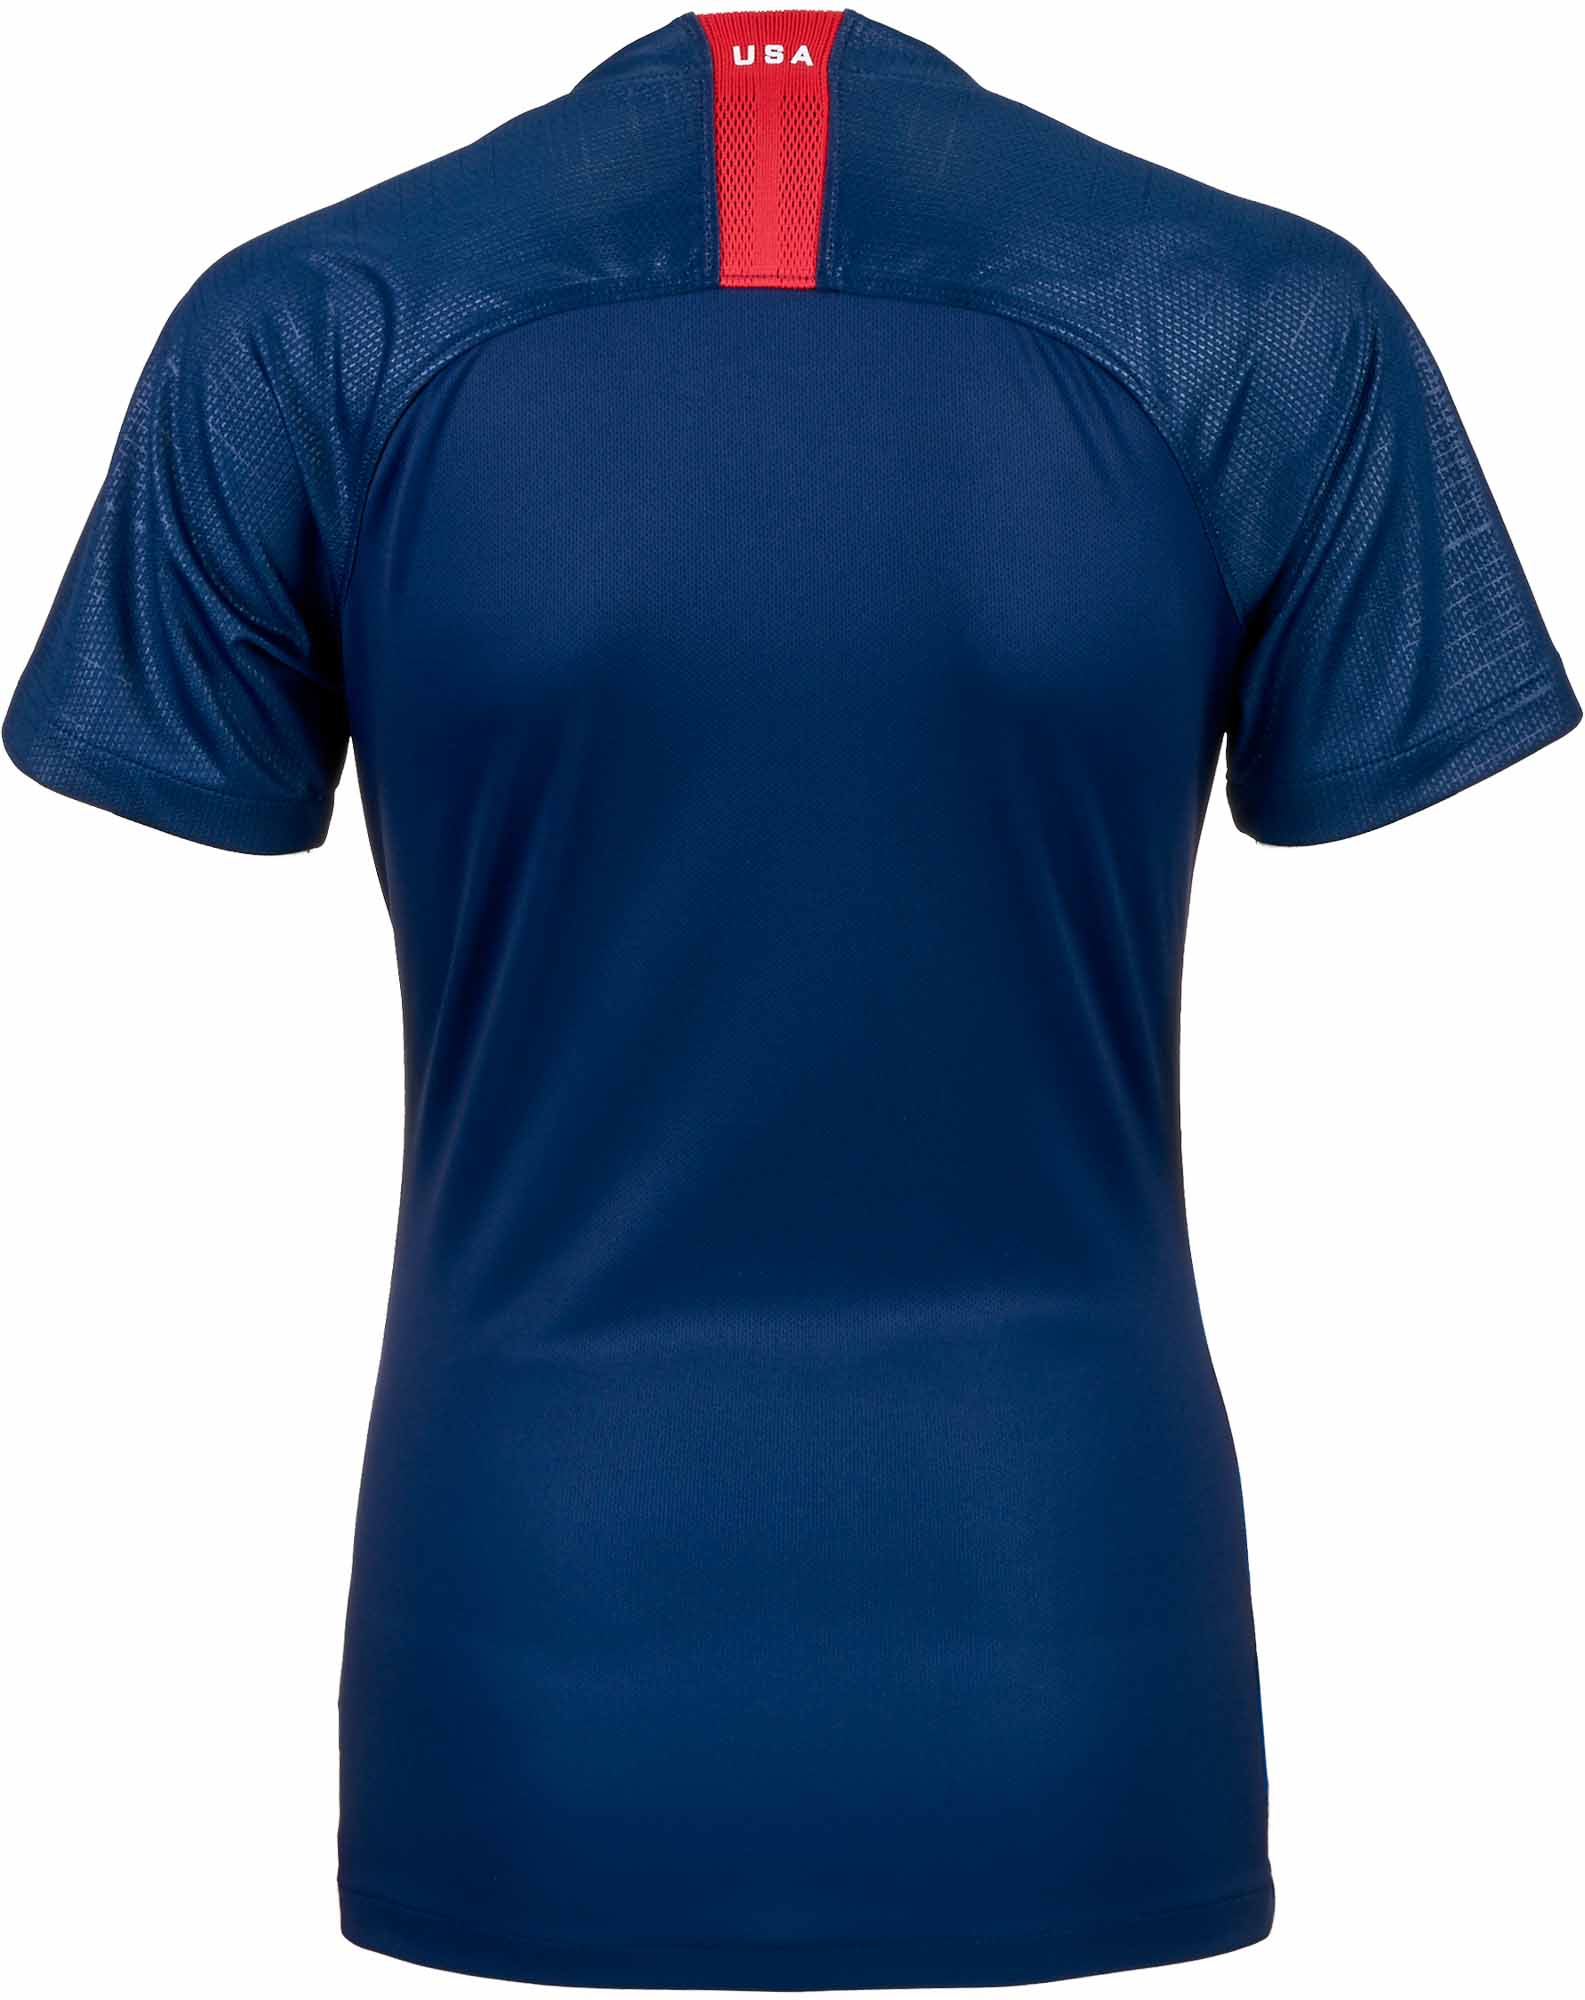 Nike USA Away Jersey - Womens 2018-19 - SoccerPro.com